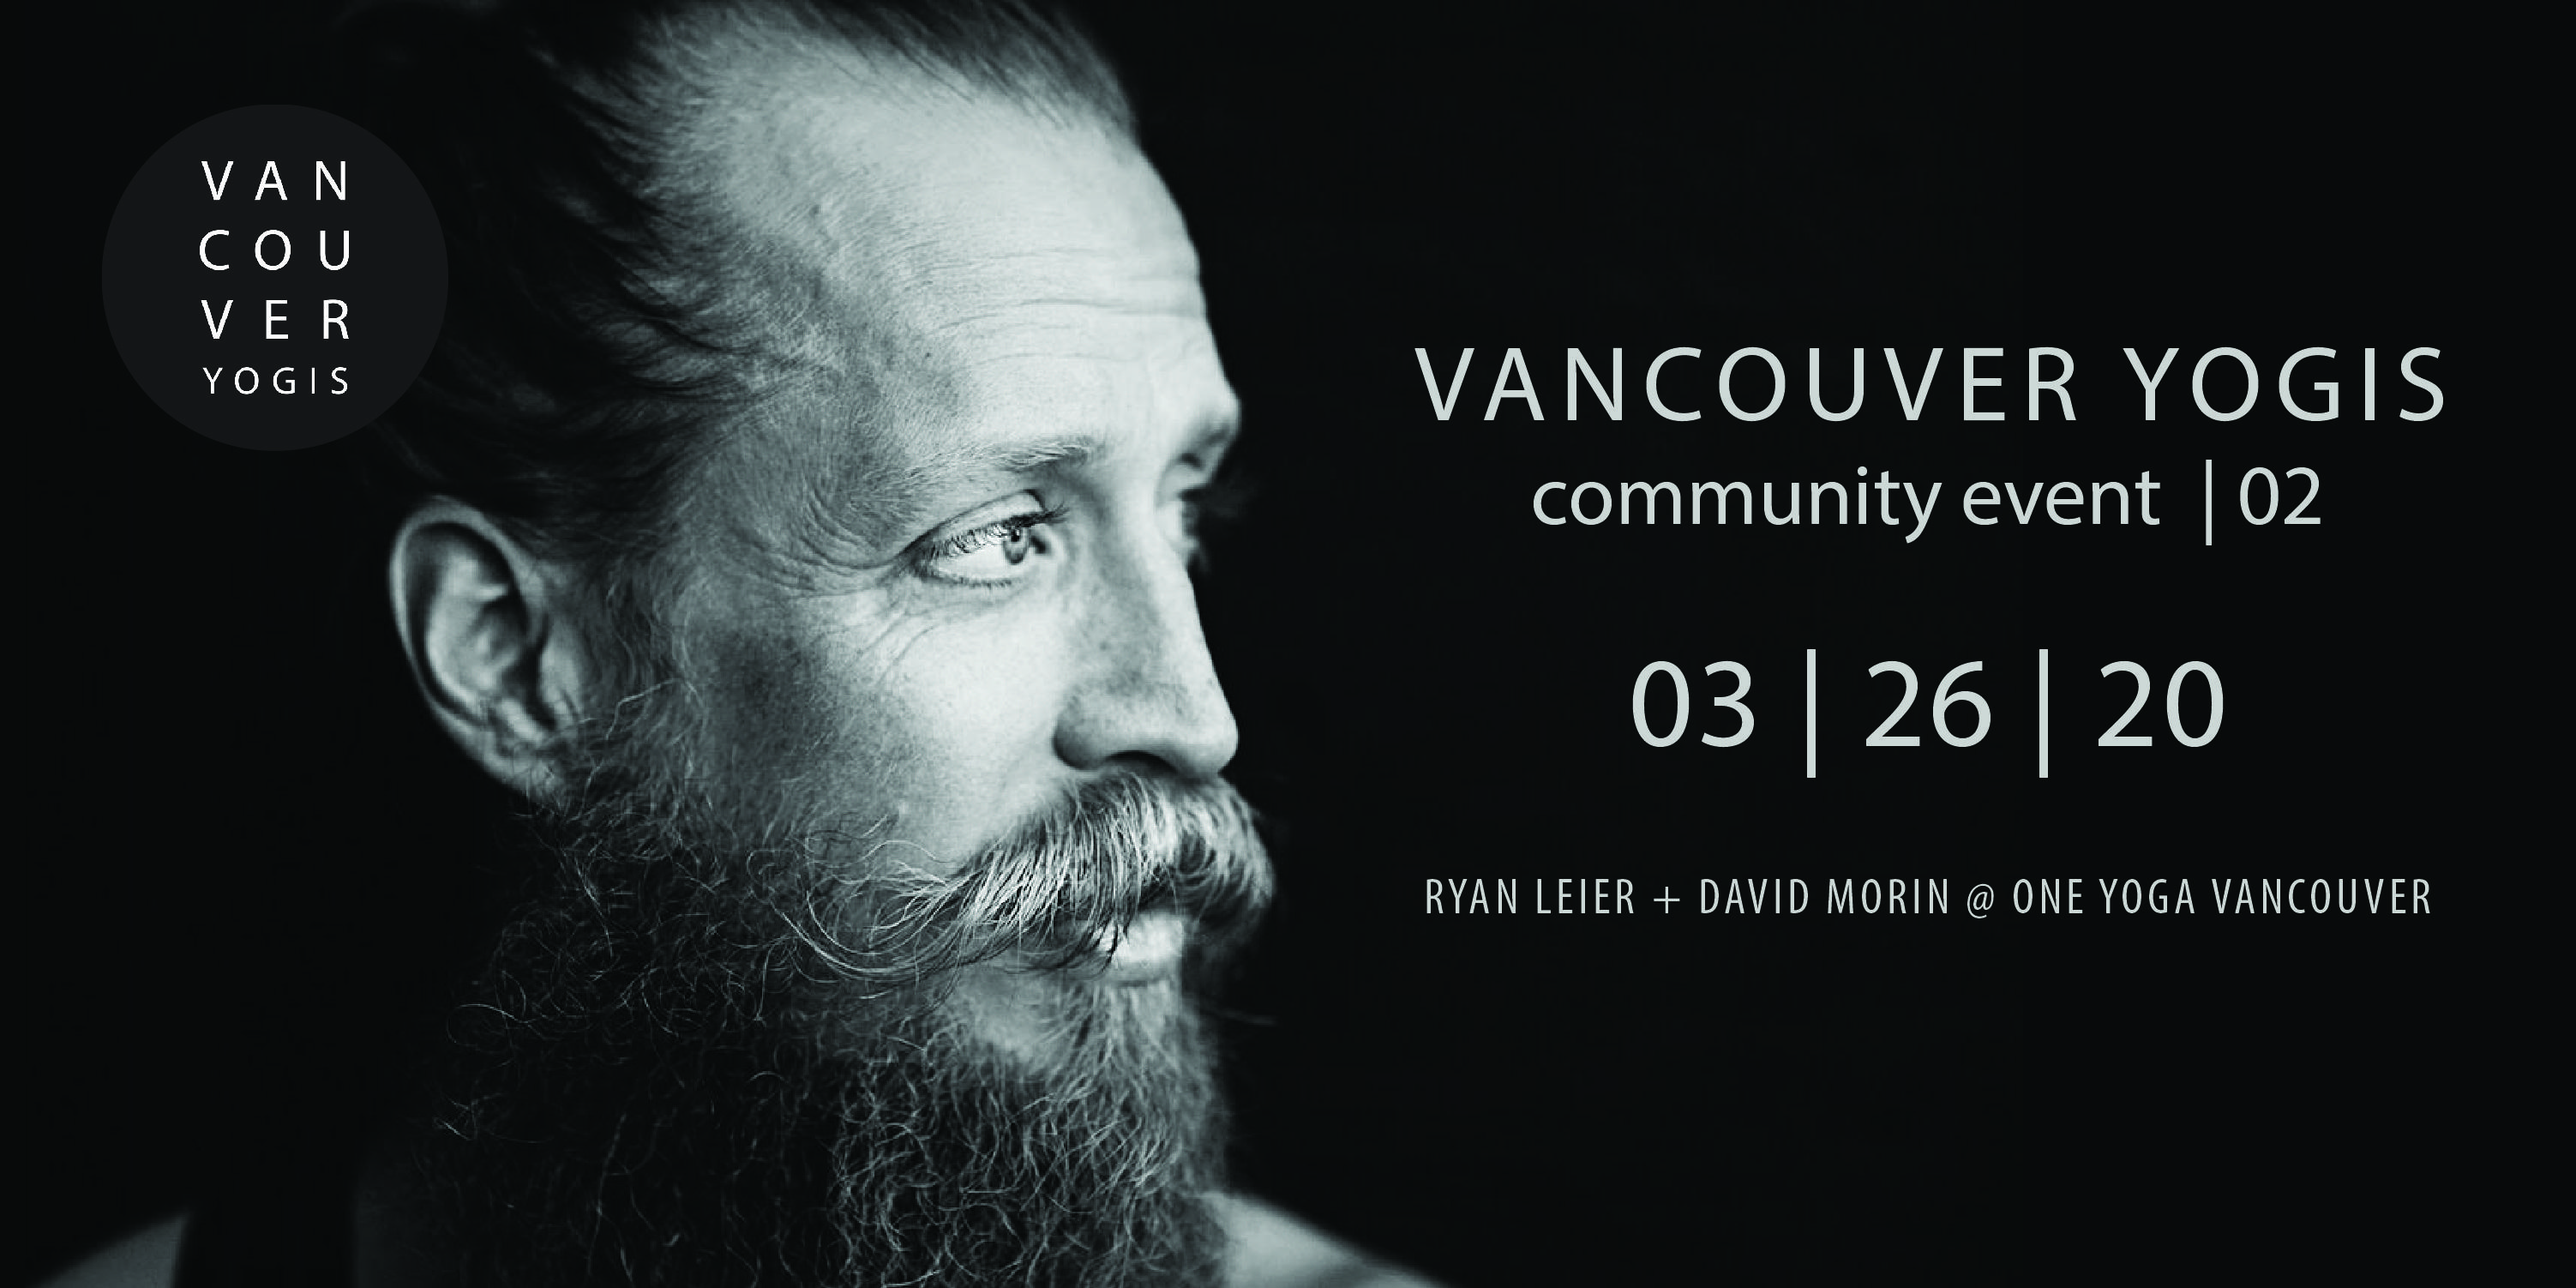 Vancouver Yogis Event # 2 - Ryan Leier and David Morin at One Yoga